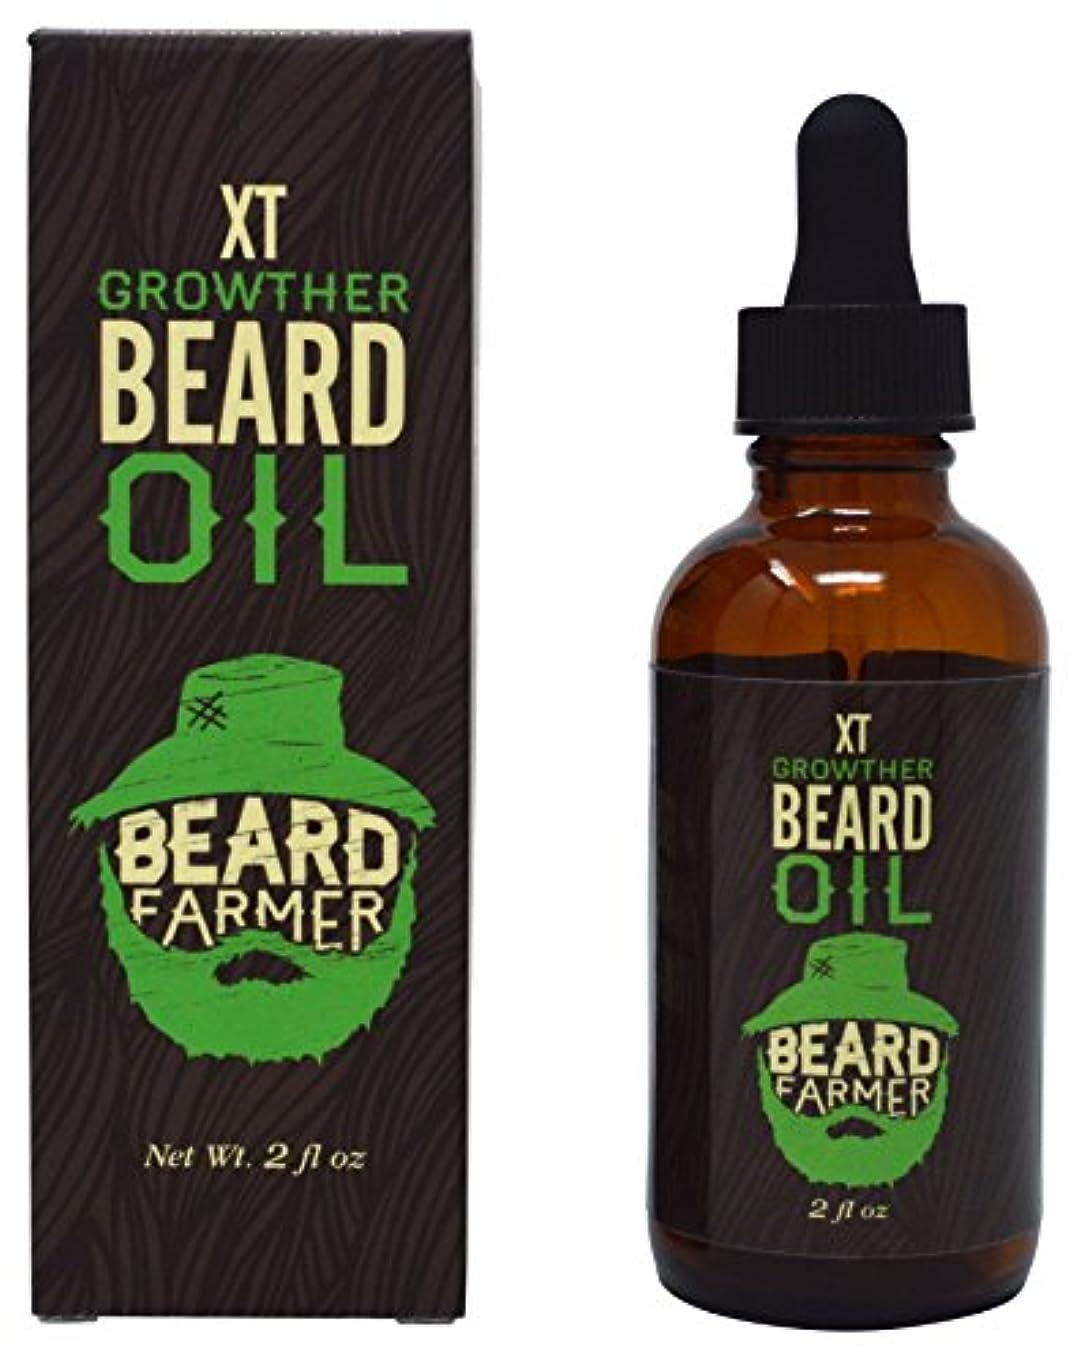 一口中央値船乗りBeard Farmer - Growther XT Beard Oil (Extra Fast Beard Growth) All Natural Beard Growth Oil 2floz